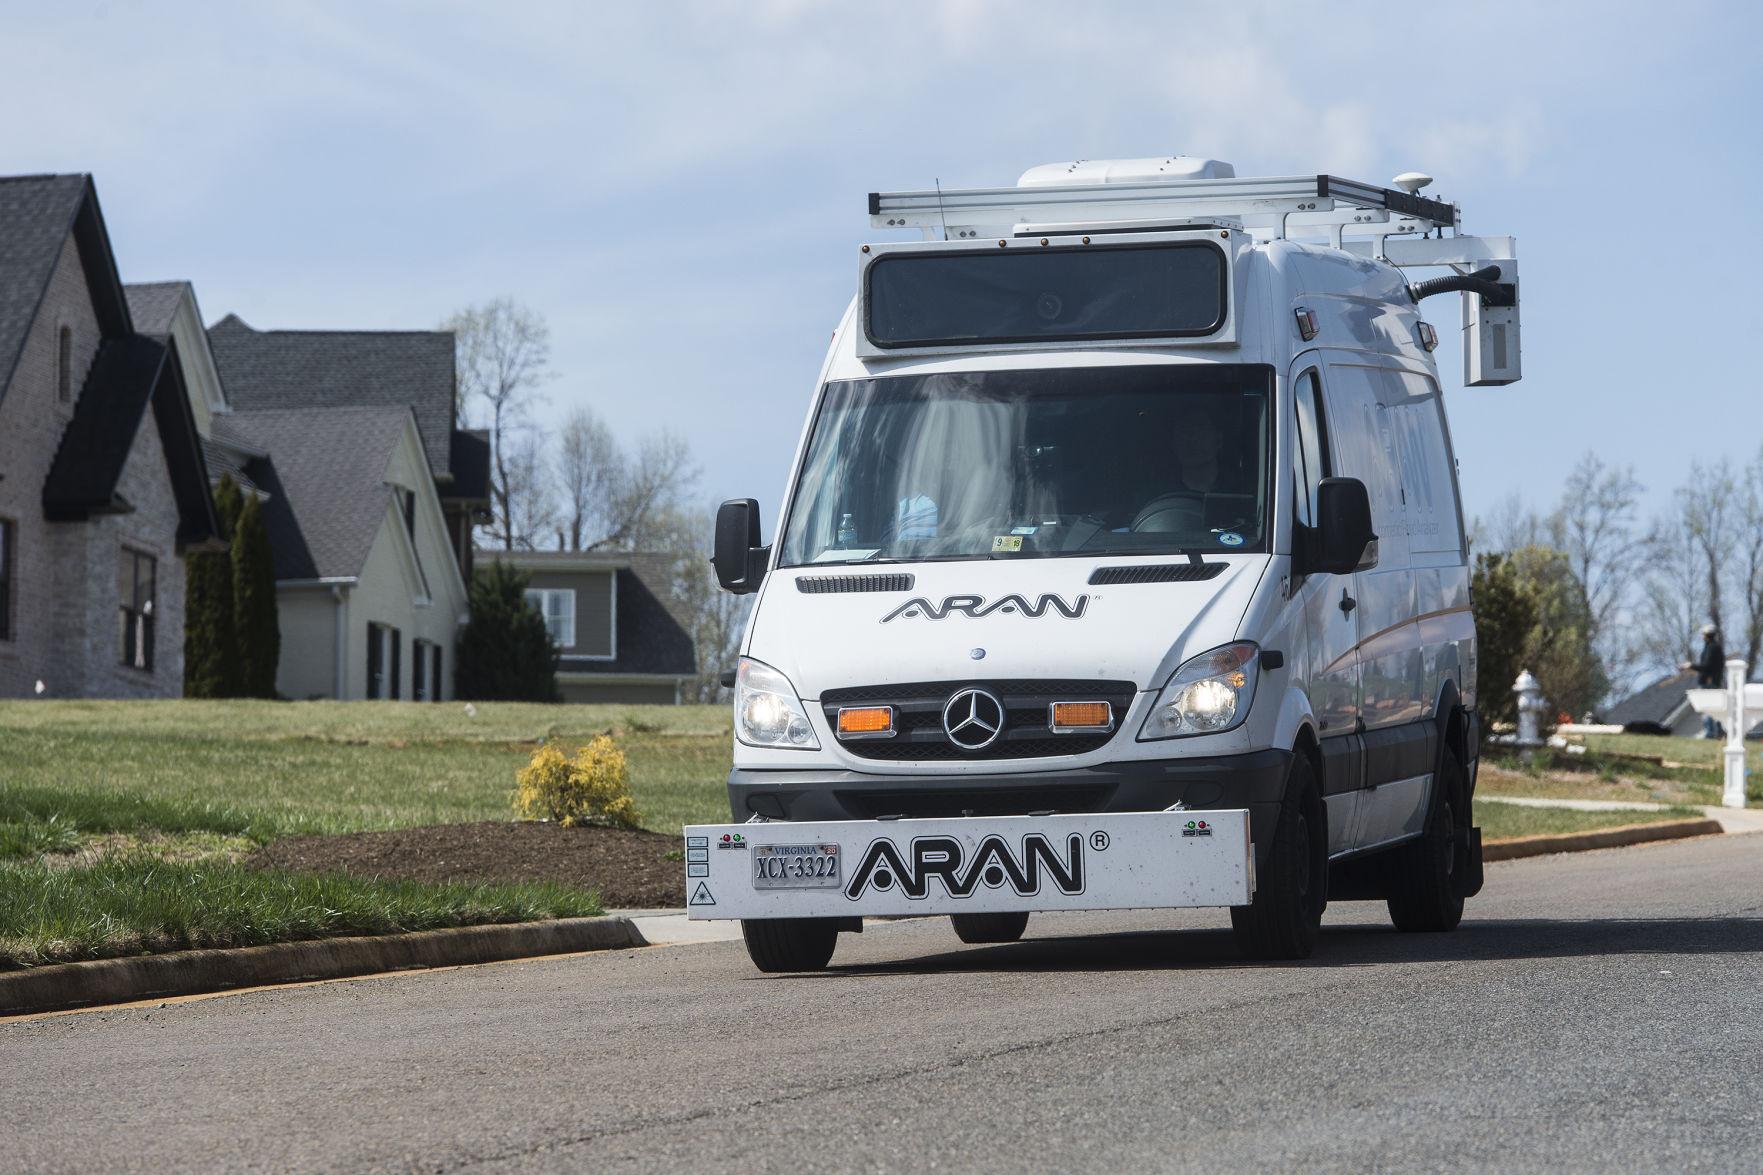 LNA 04142018 Road Survey 01 High tech vans